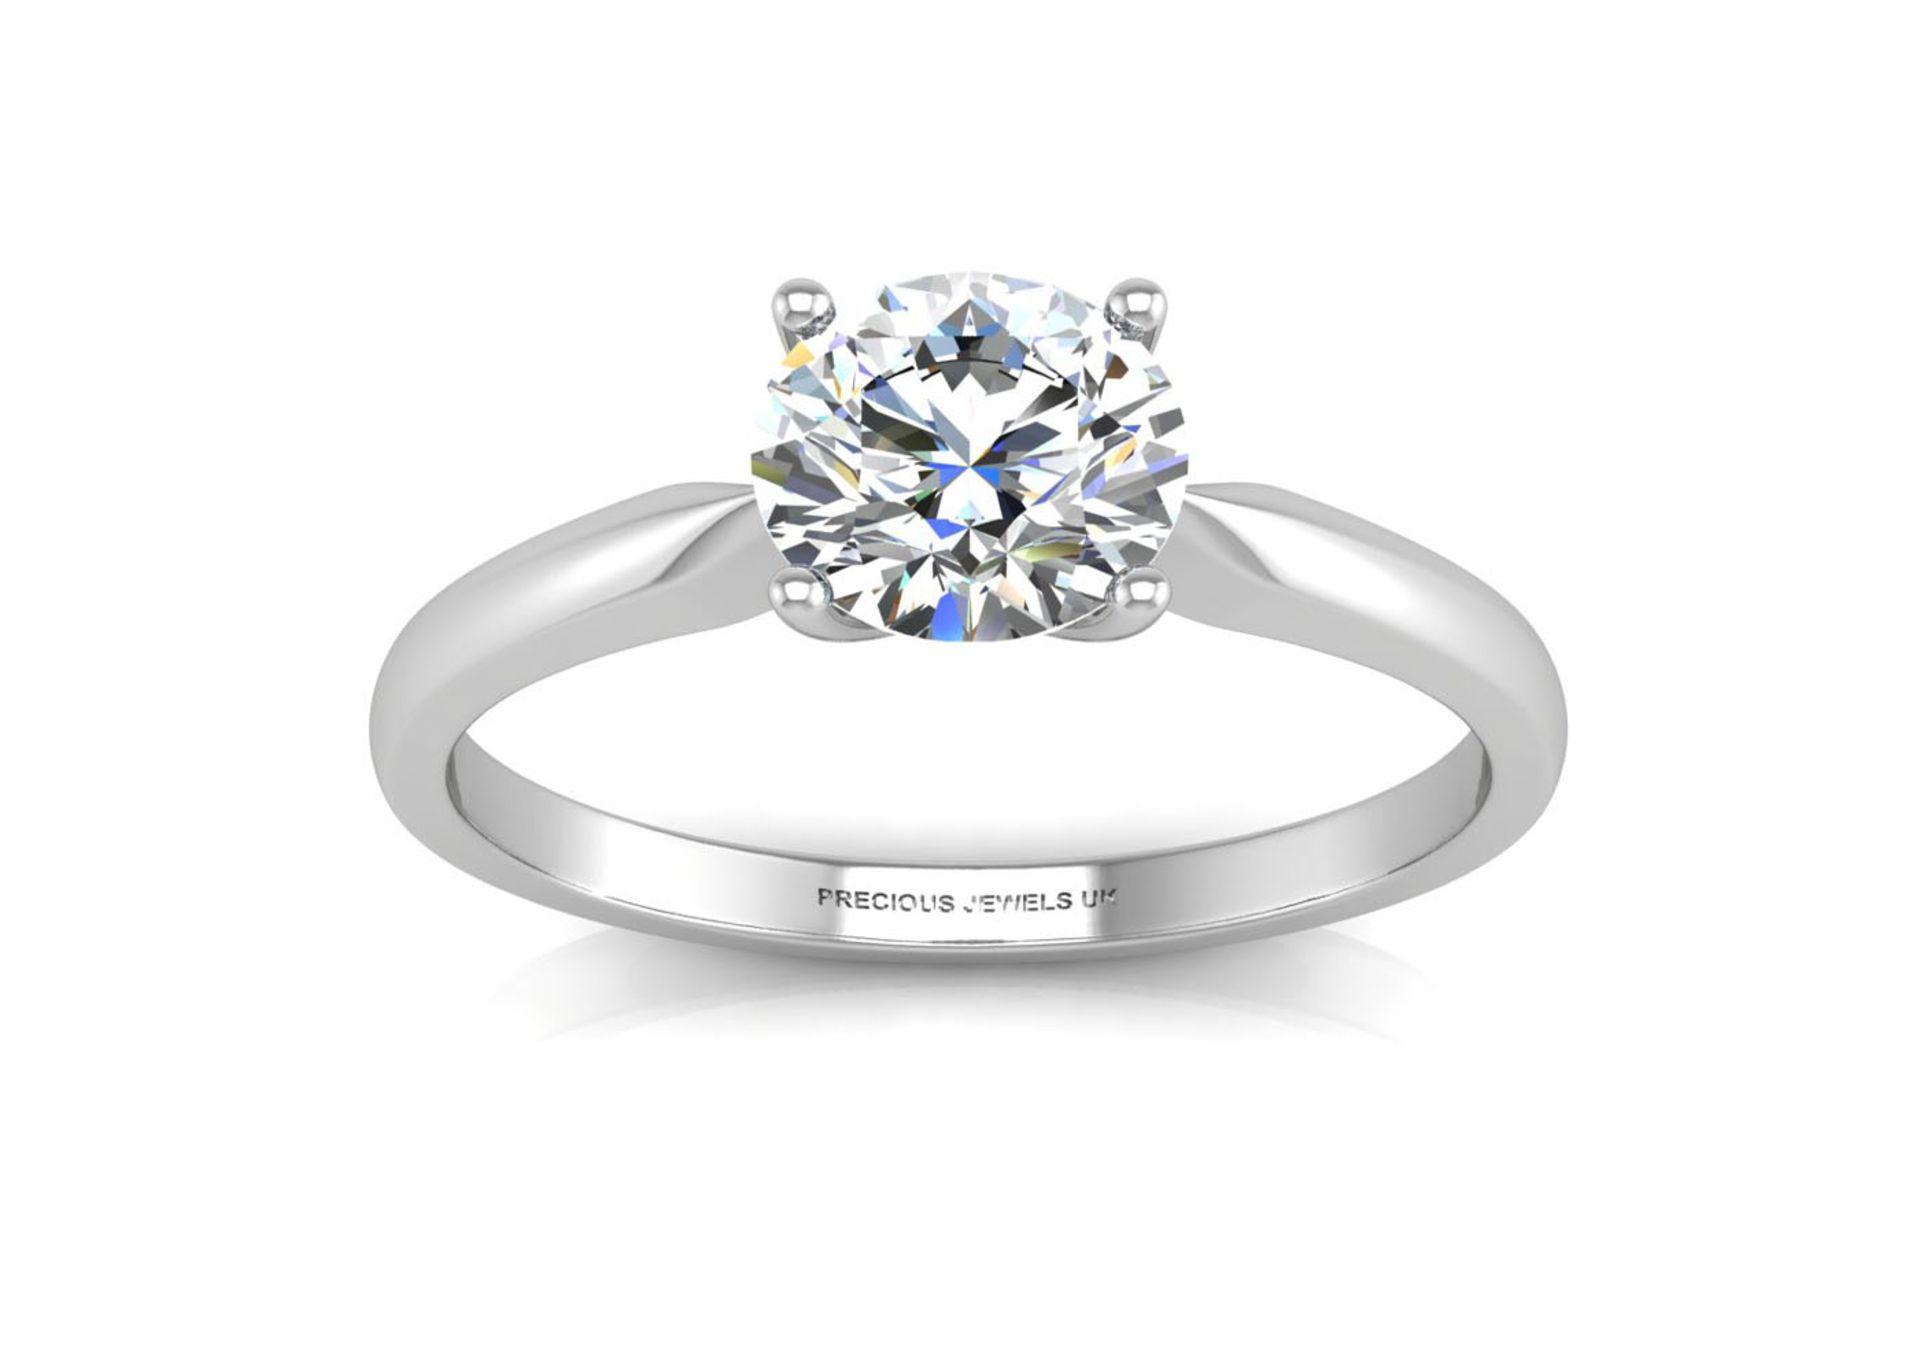 Lot 13 - 18k White Gold Single Stone Claw Set Diamond Ring J SI 0.20